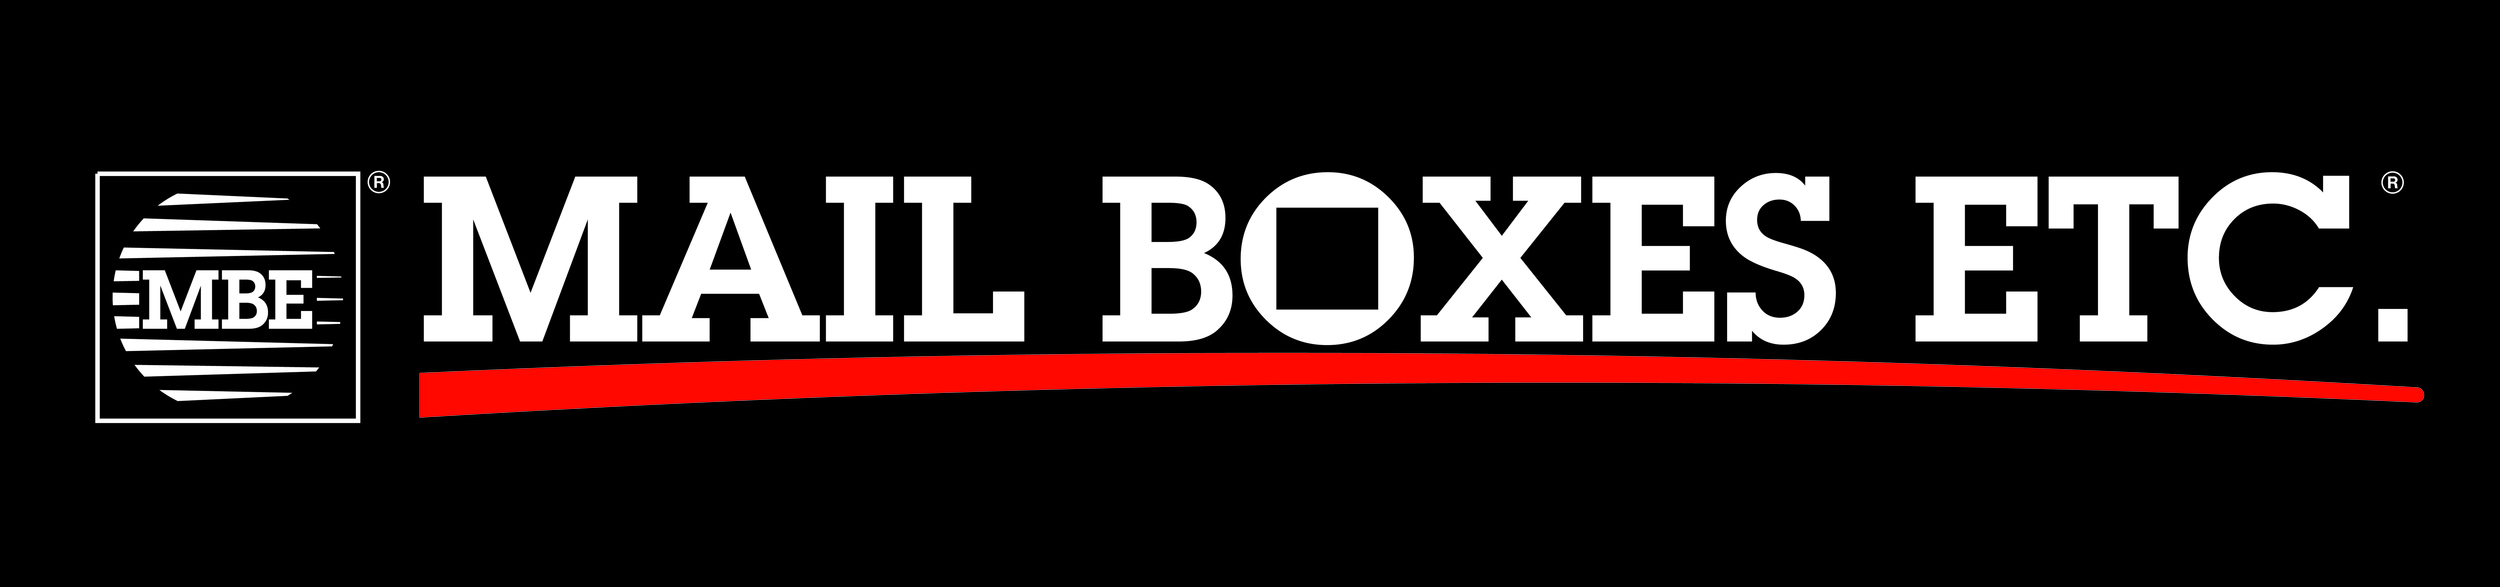 Mail-Boxes-Etc-shop-sign-logo1.jpg